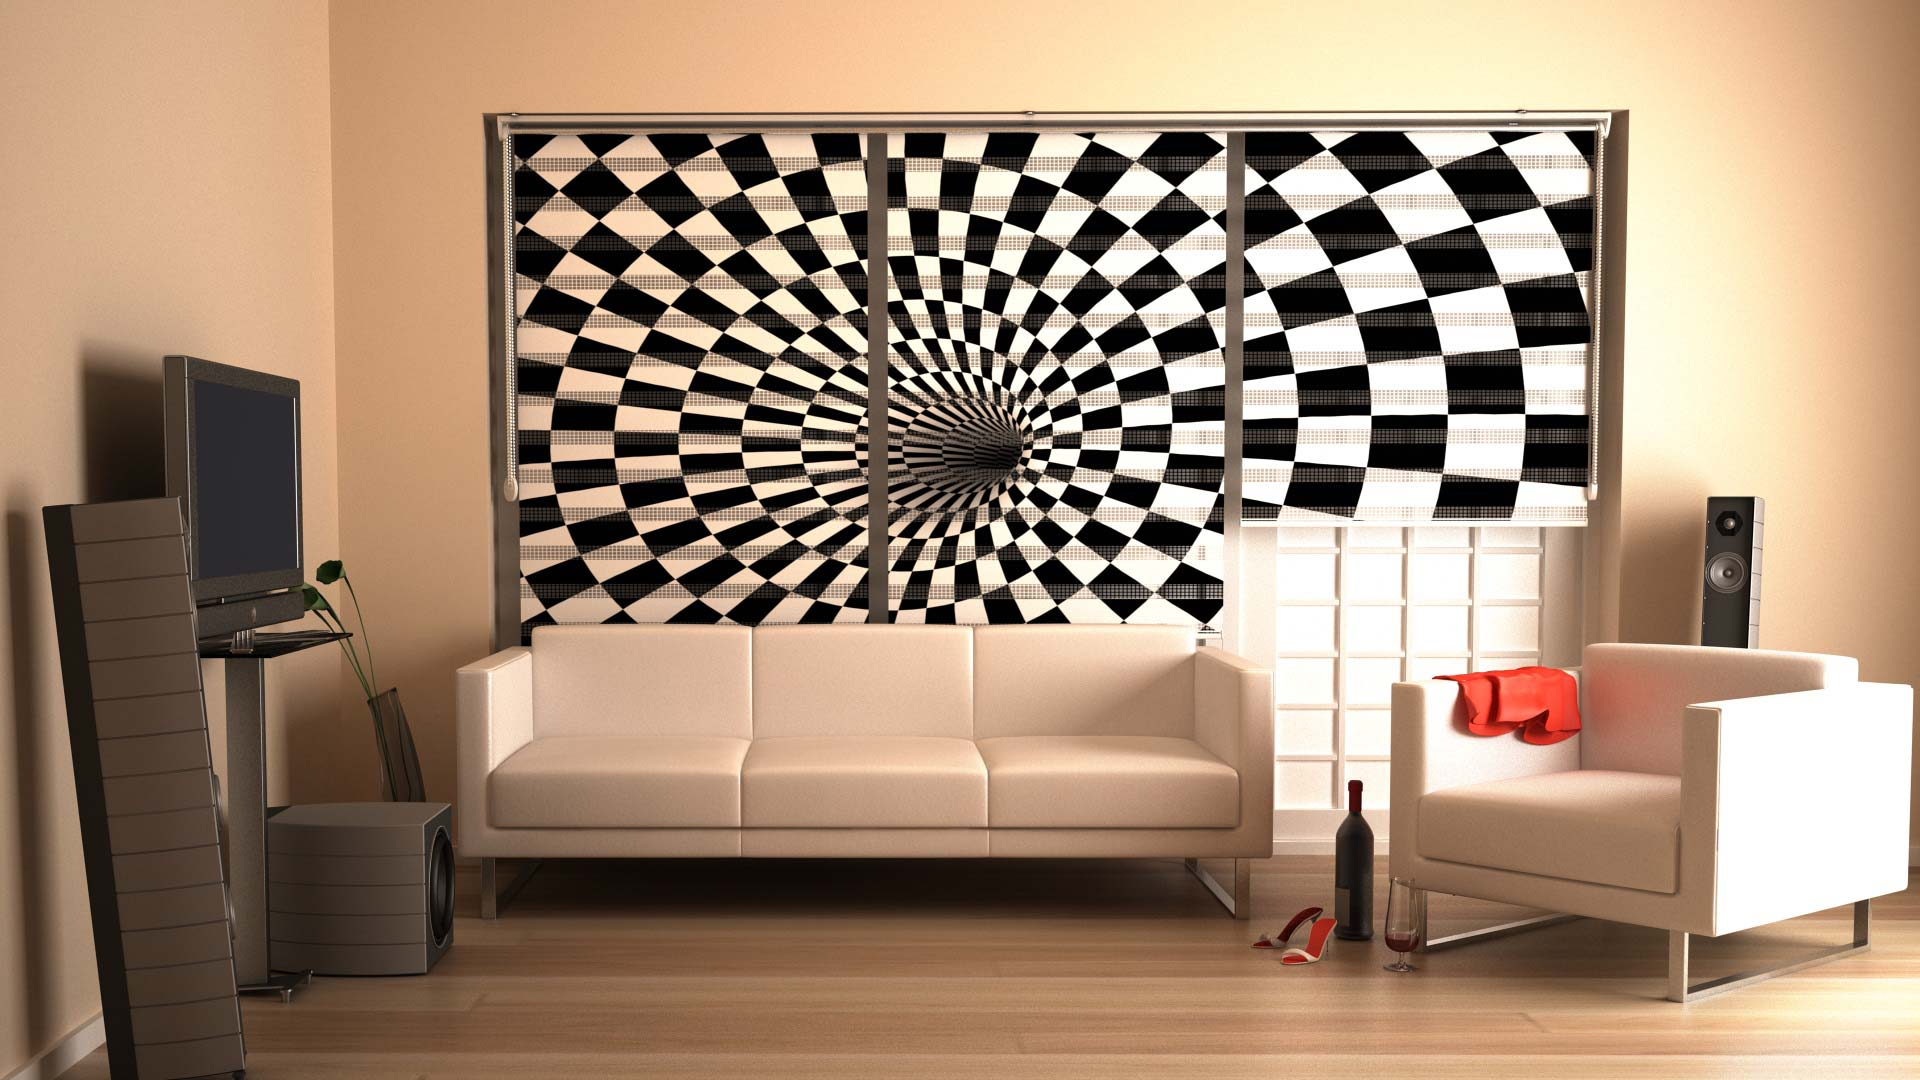 rollo bedruckt fabulous bayern mnchen lamellen rollo vorhang leinwand teppich nach eigenem foto. Black Bedroom Furniture Sets. Home Design Ideas